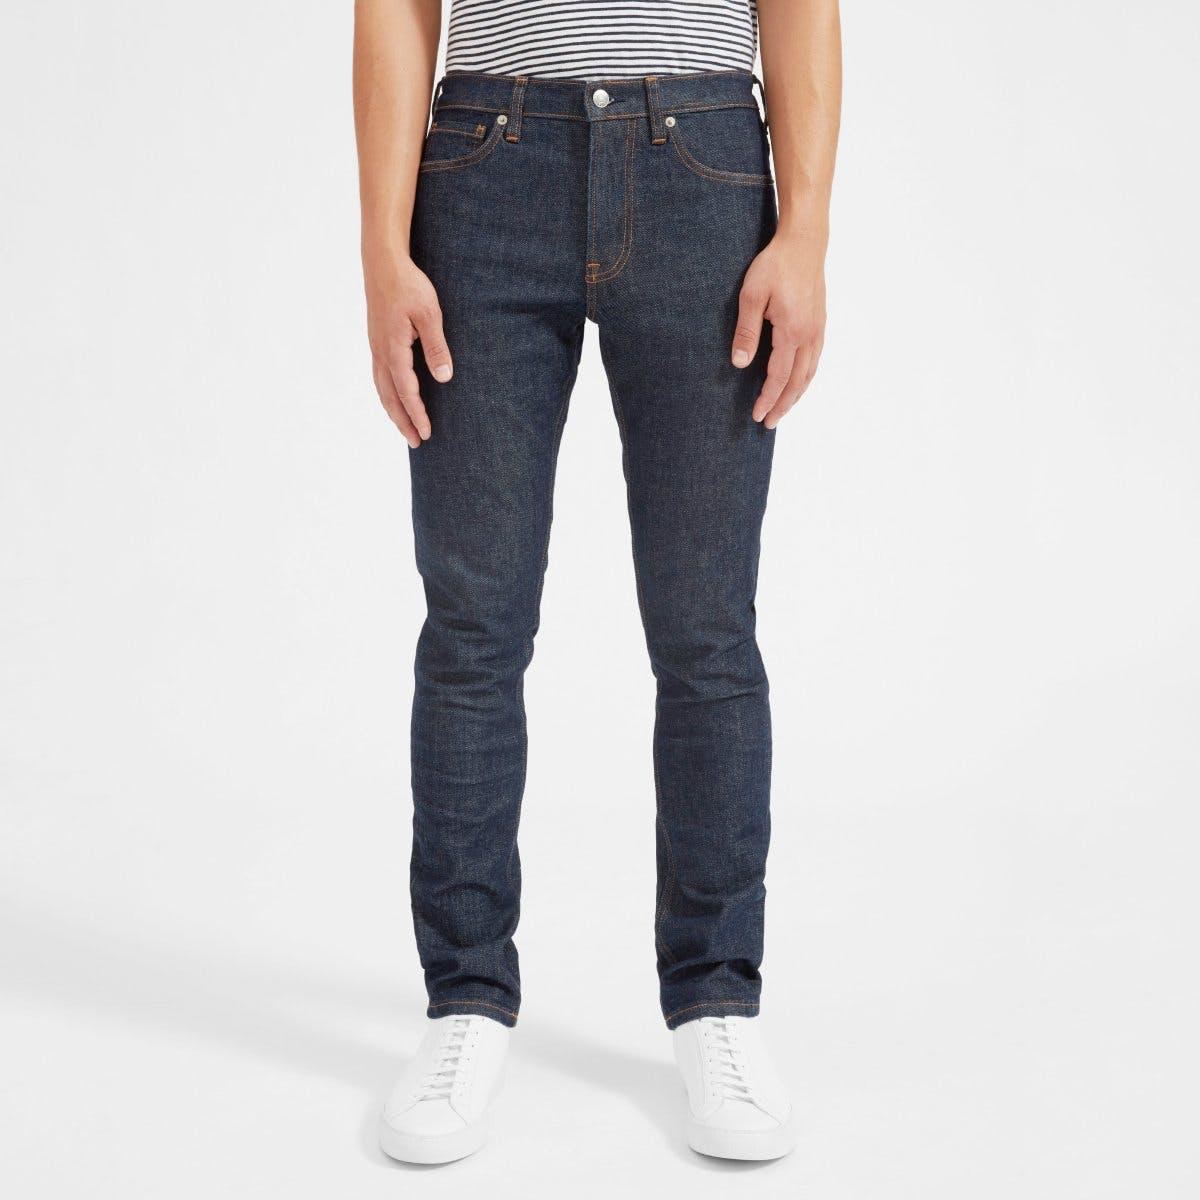 The Slim Fit Jean